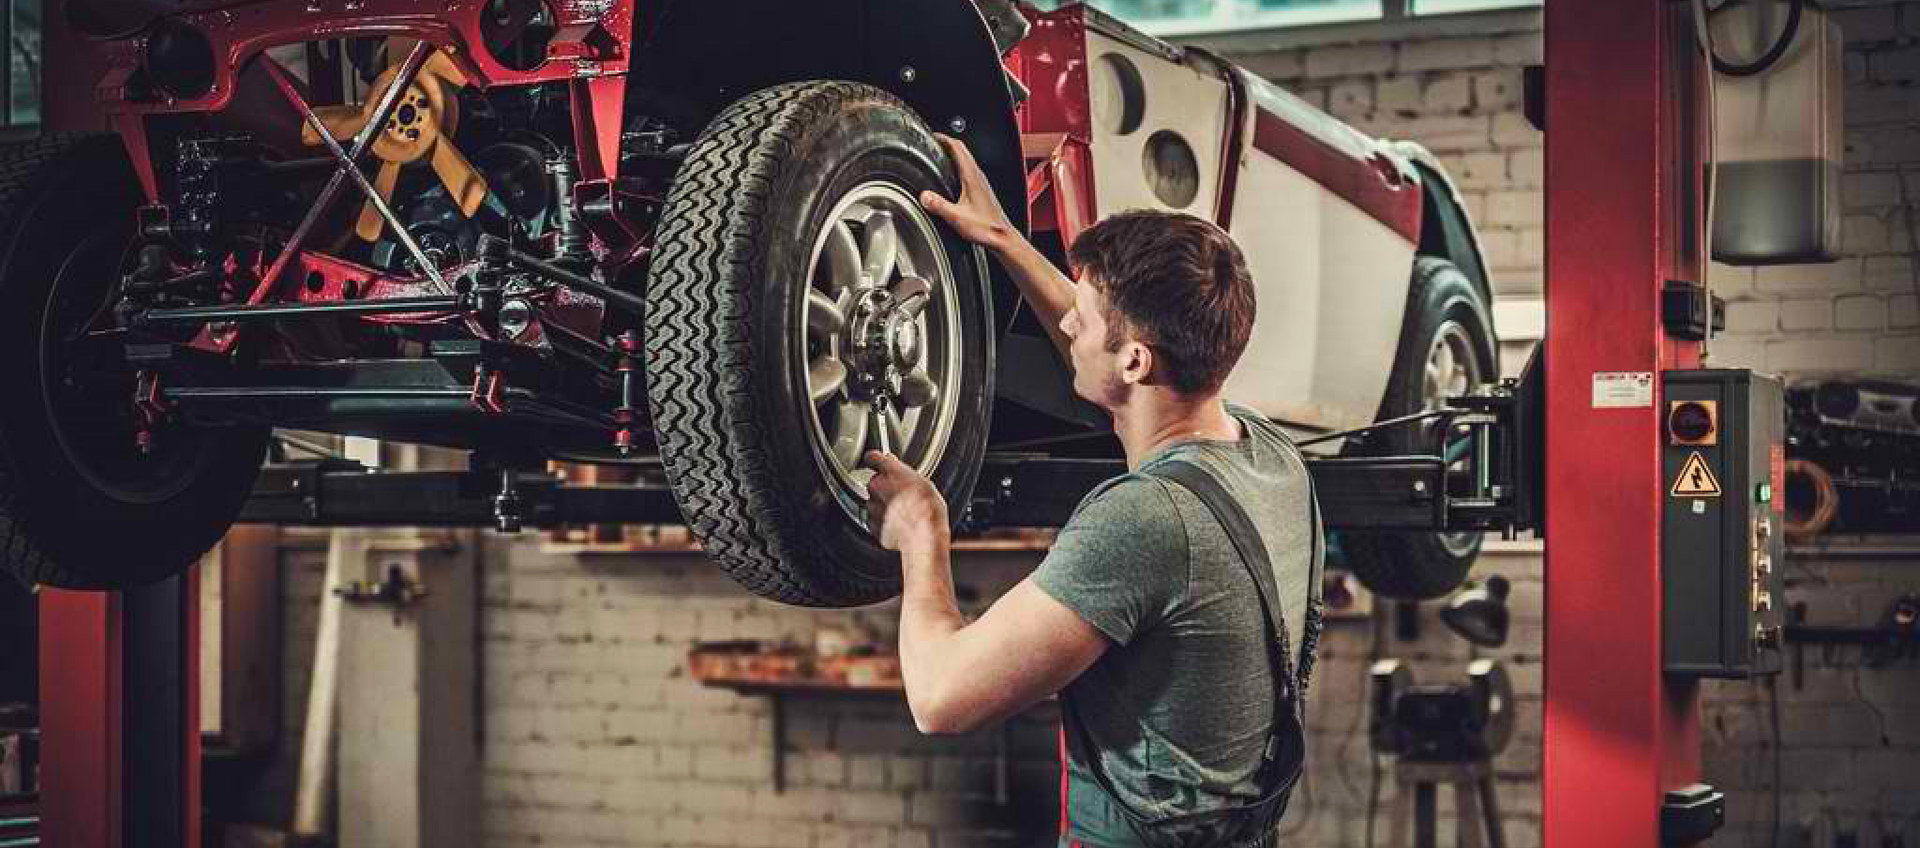 male maechanic removing the tire